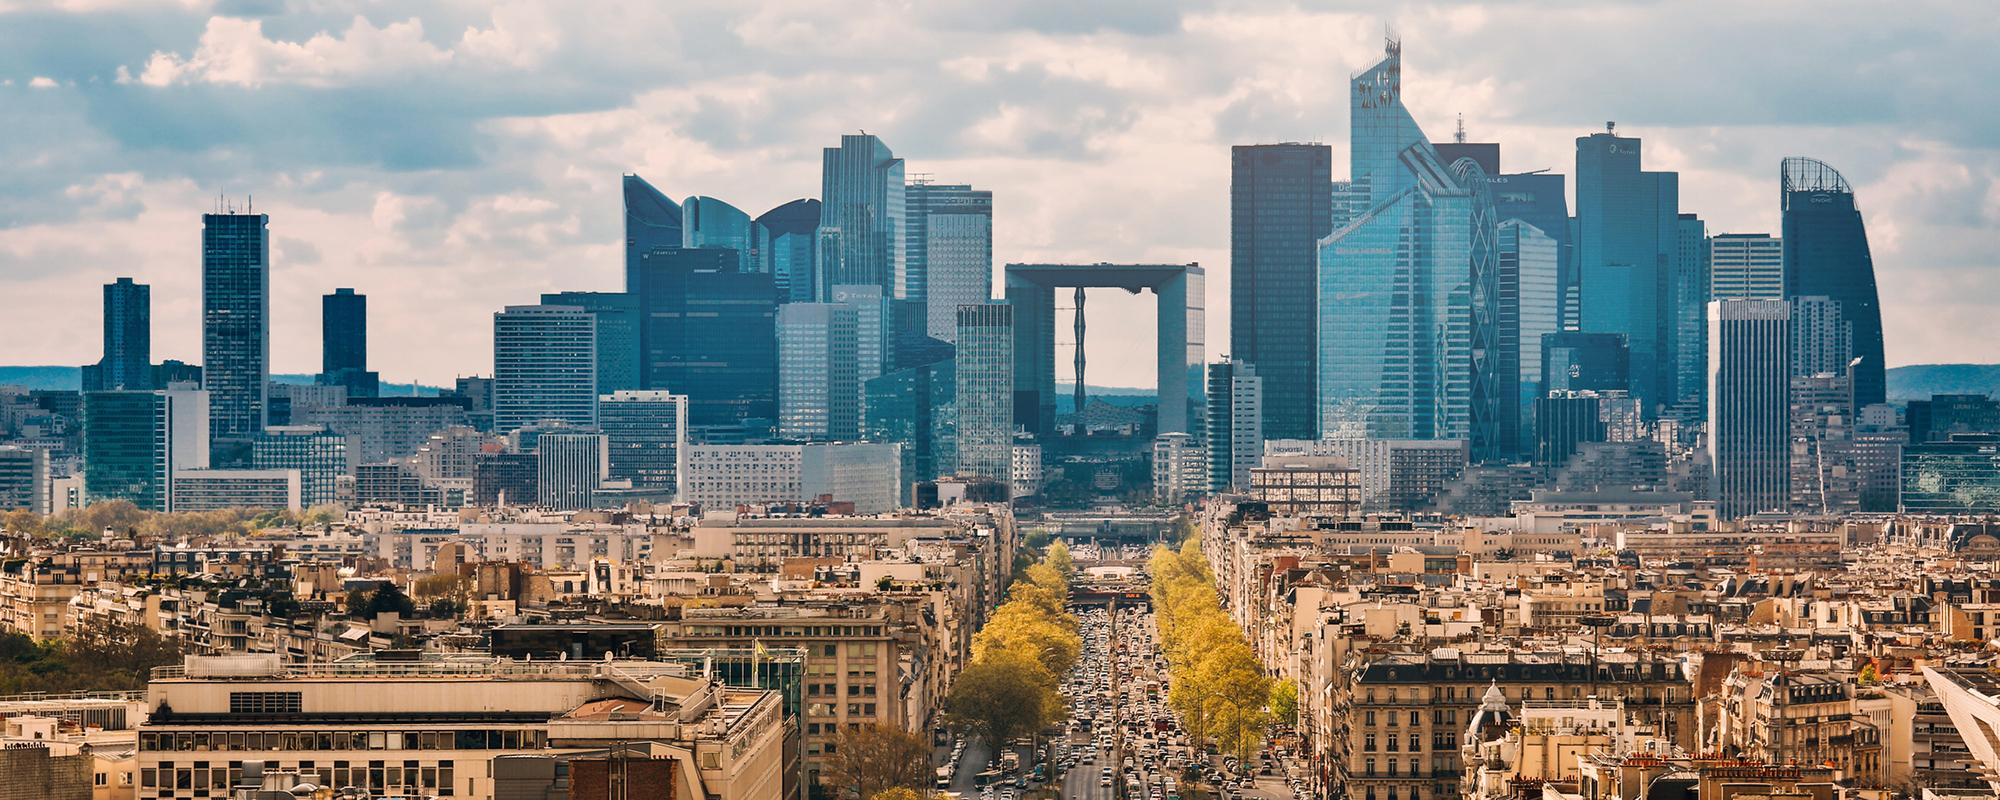 La Defense in Paris. Getty Images